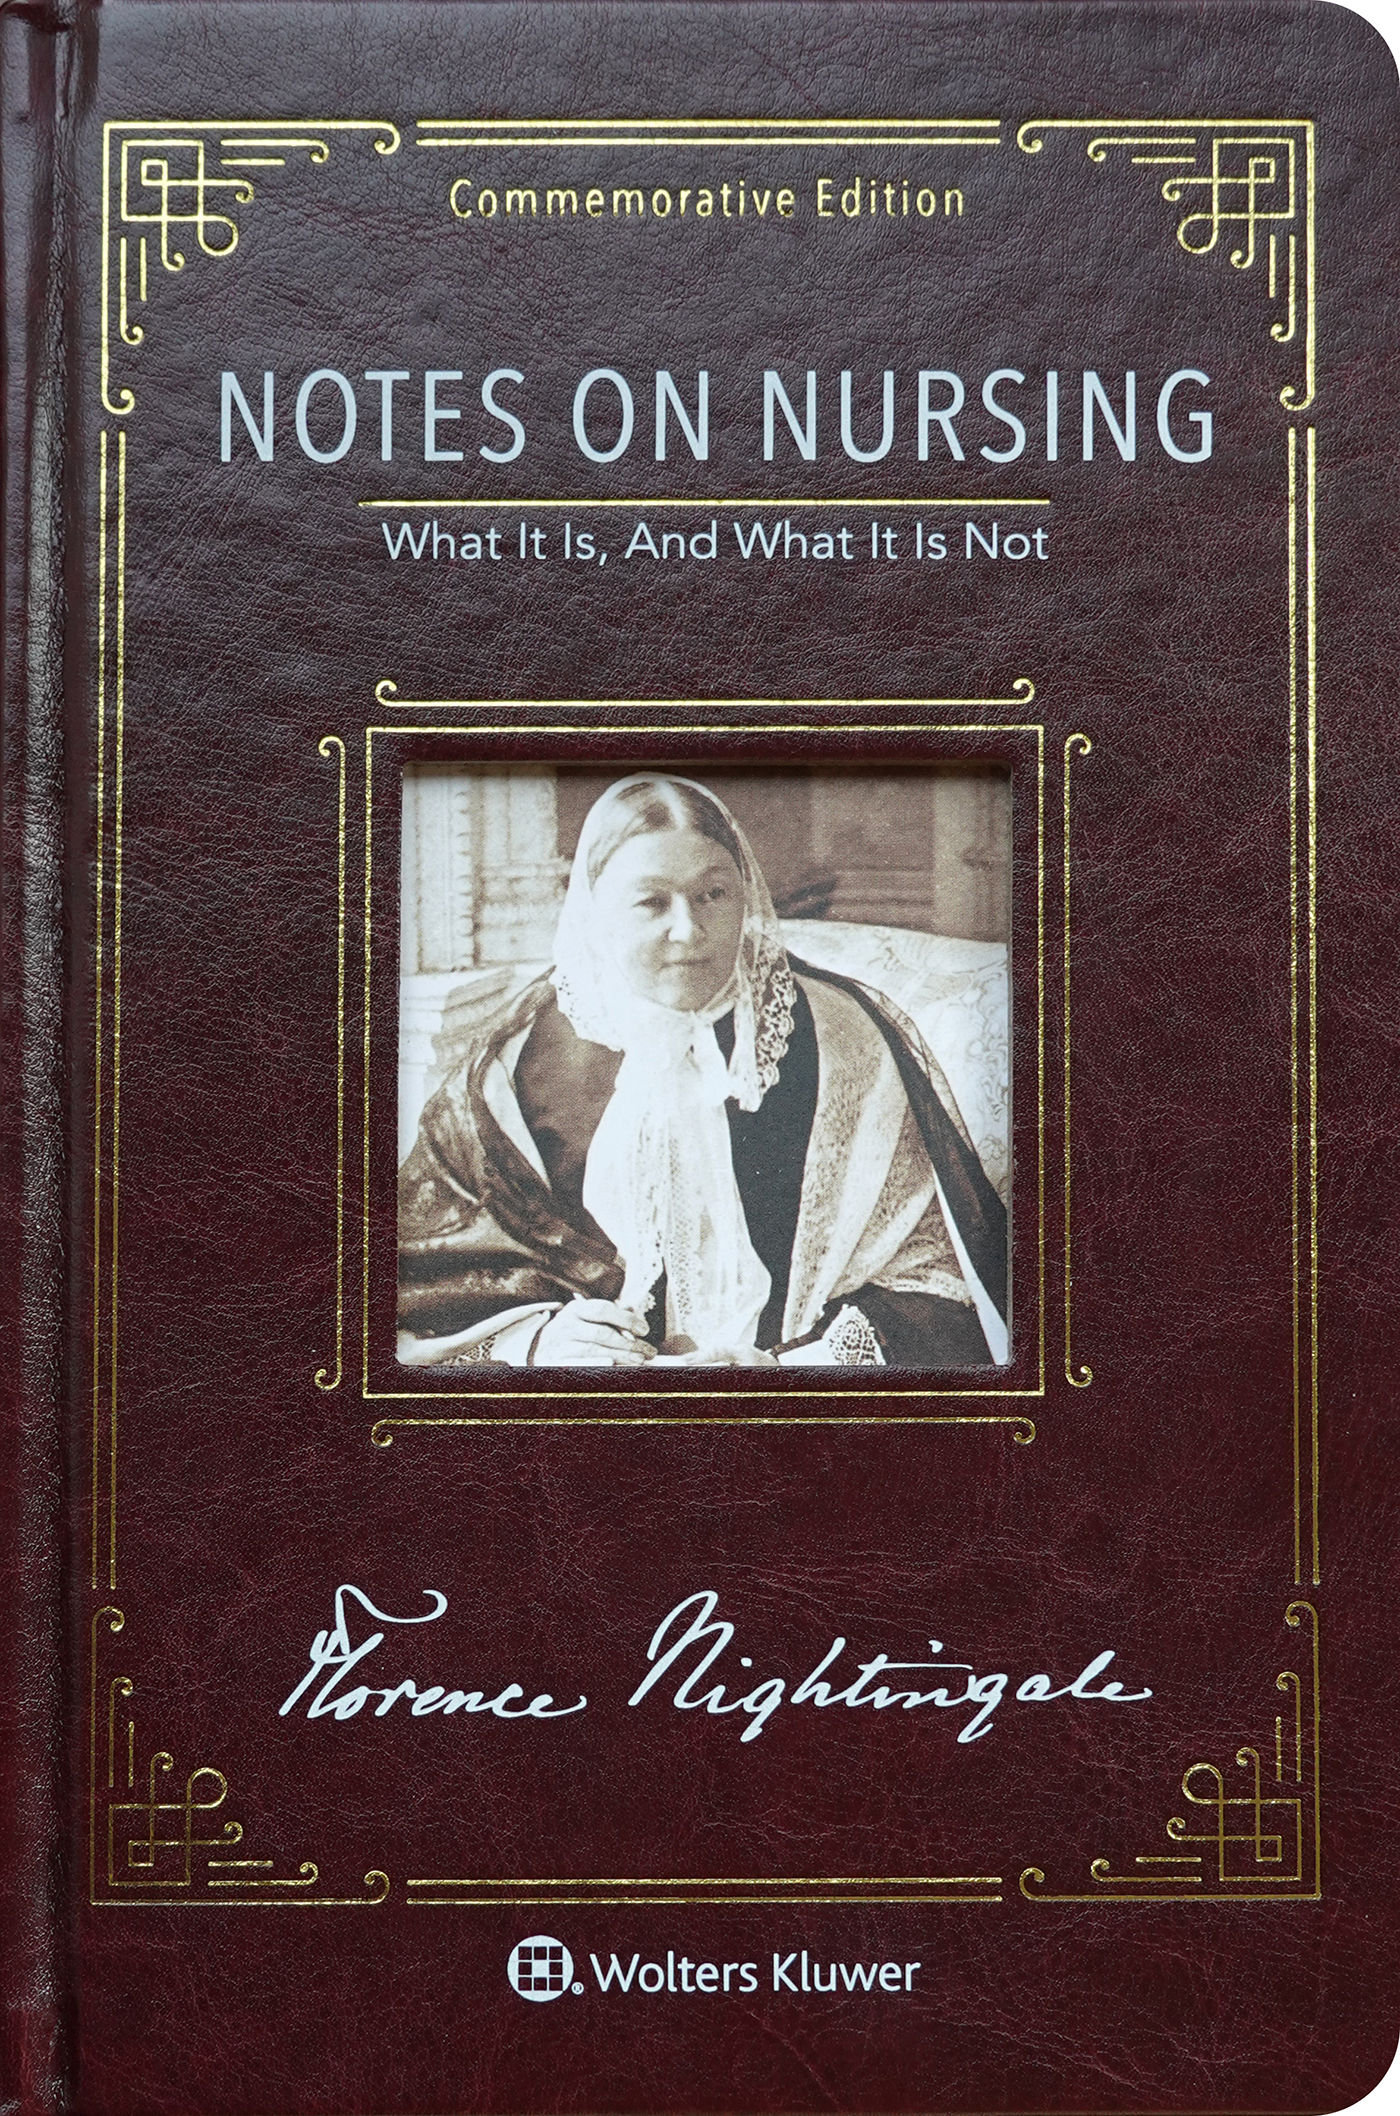 Notes on Nursing Summary & Study Guide Description